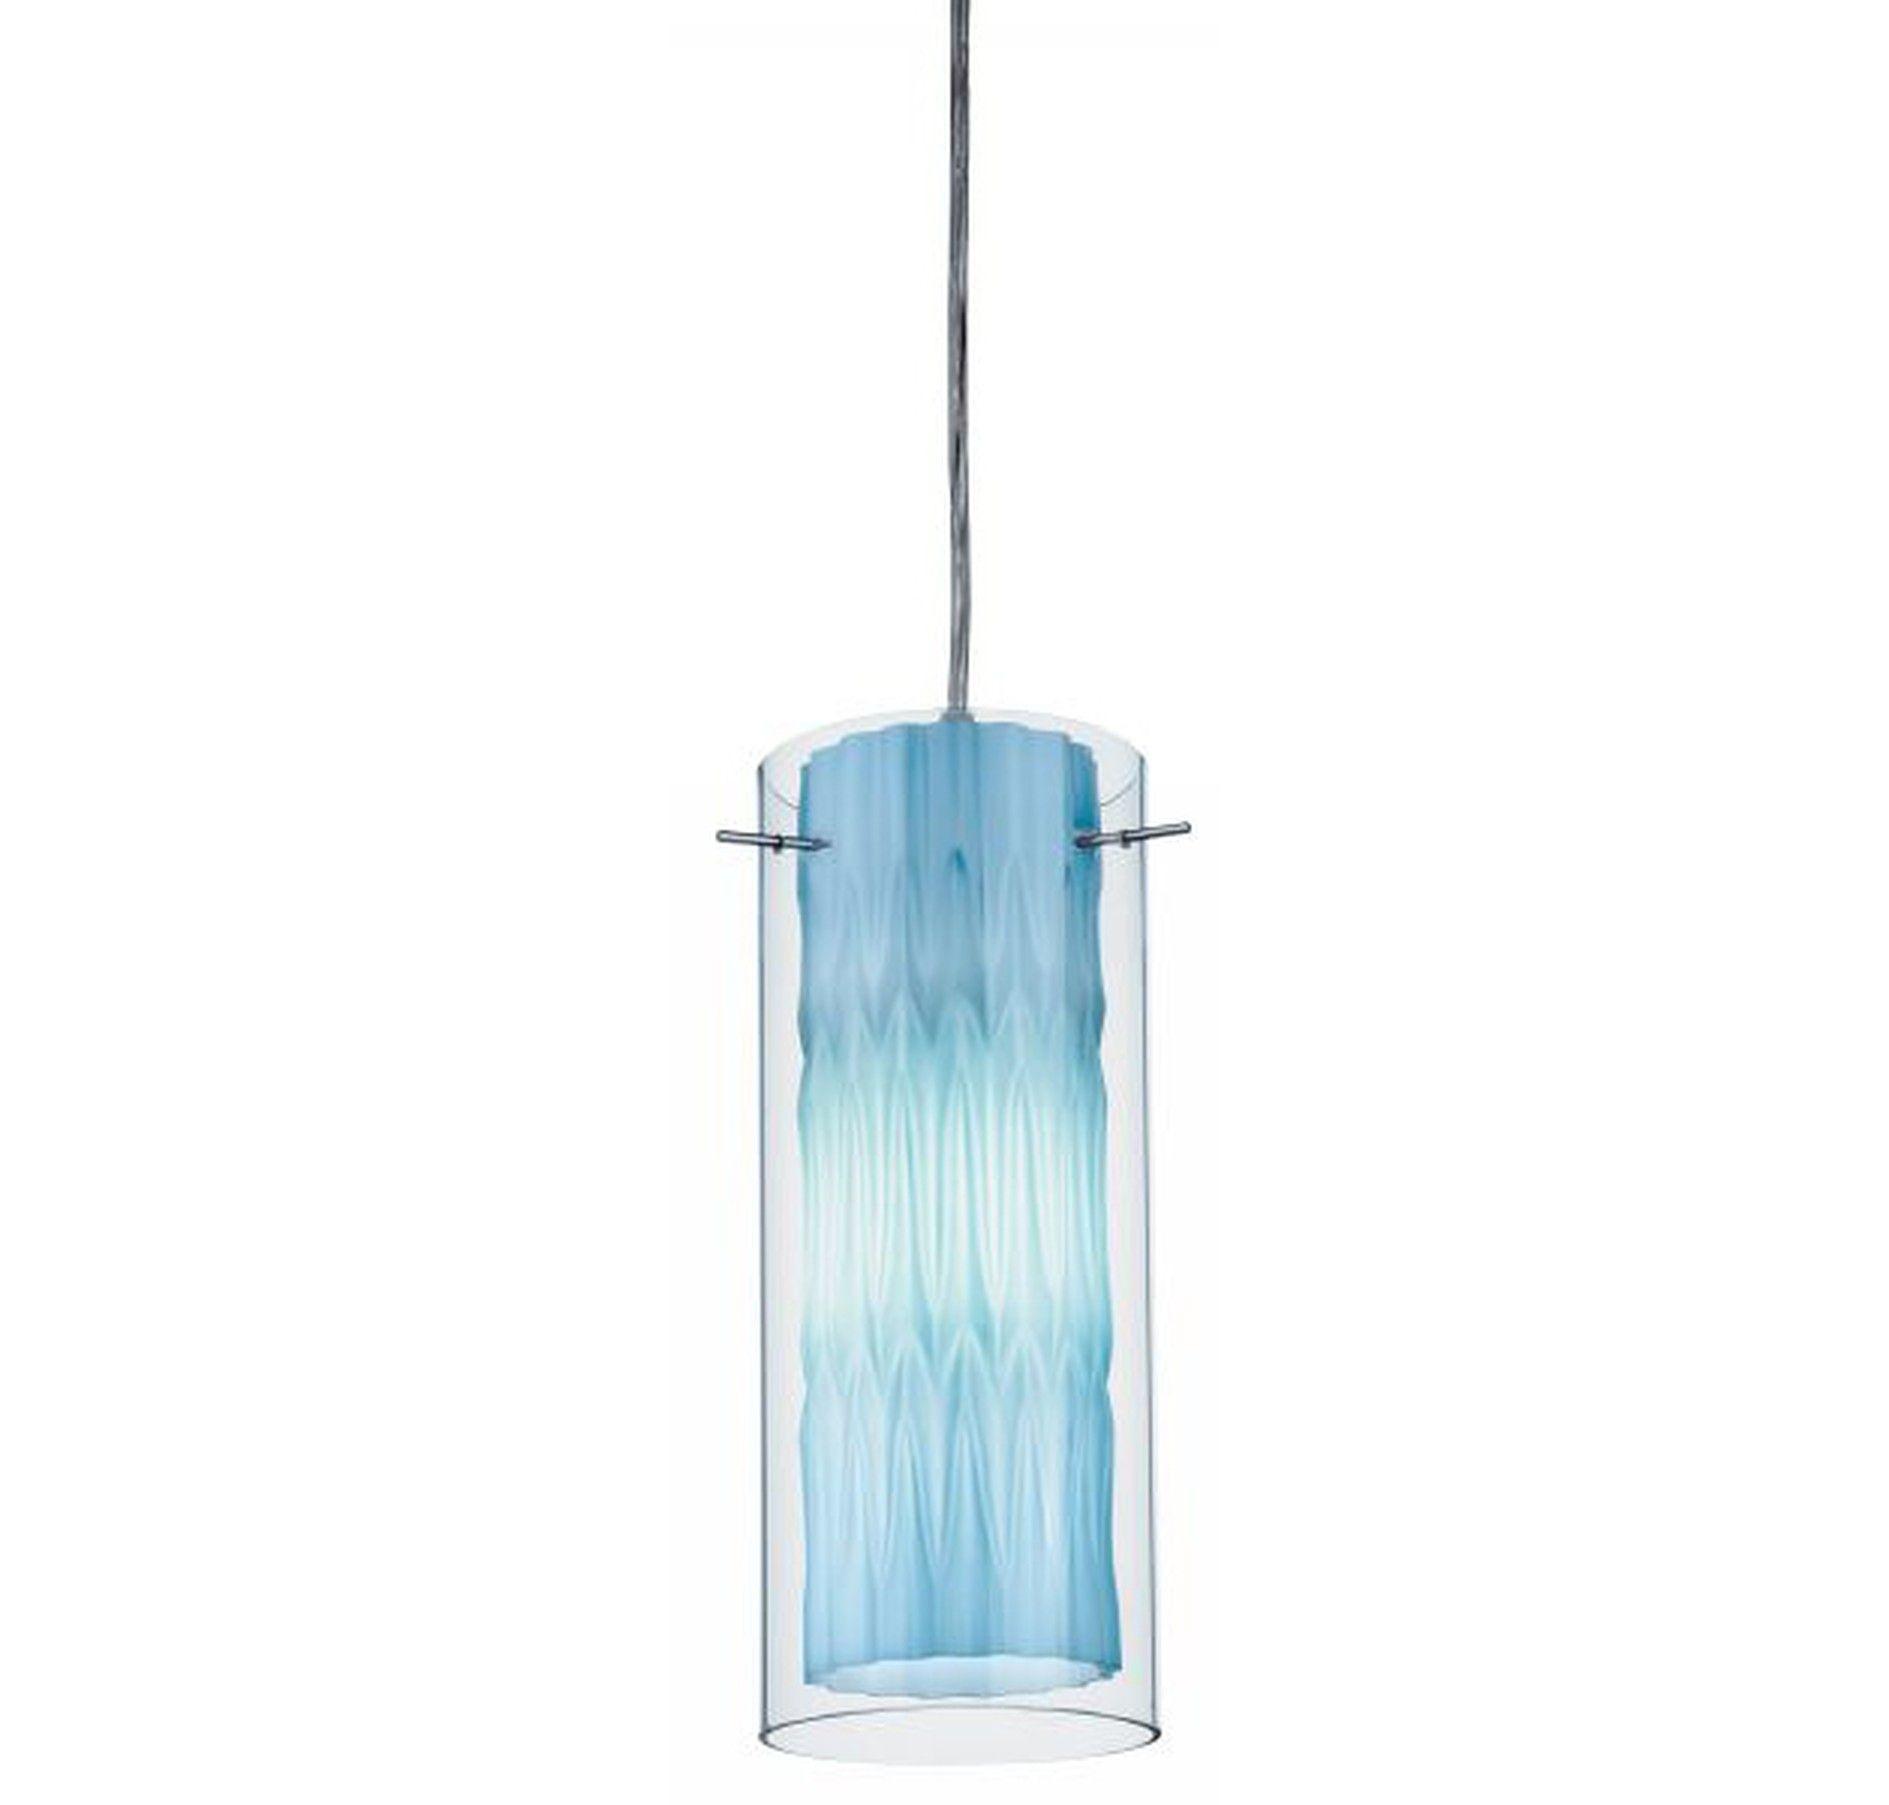 Glass Pendant Lighting For Kitchen Islands Kitchen Pendant Lighting Blue Roselawnlutheran